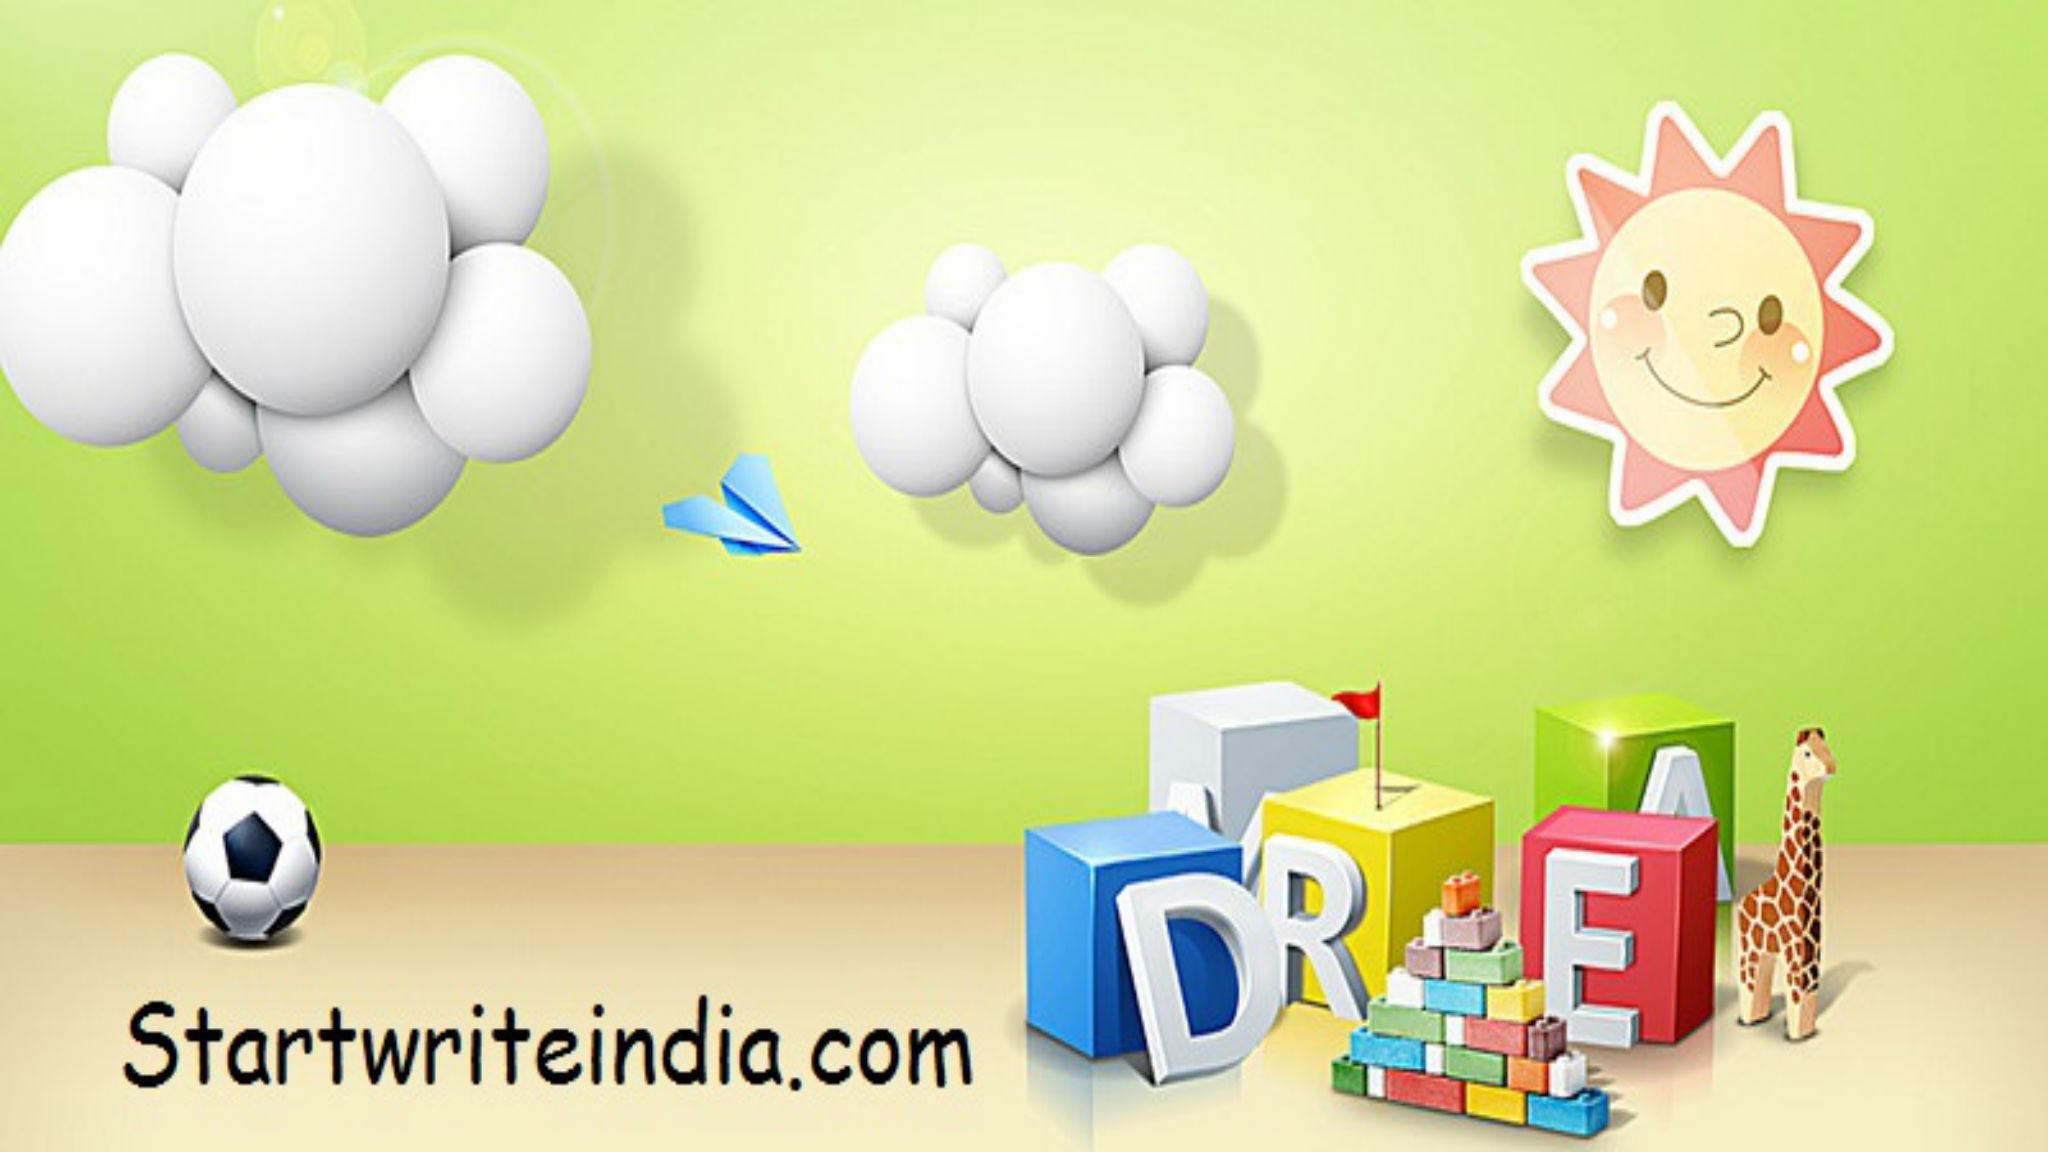 StartwriteIndia (@startwriteindia) Cover Image